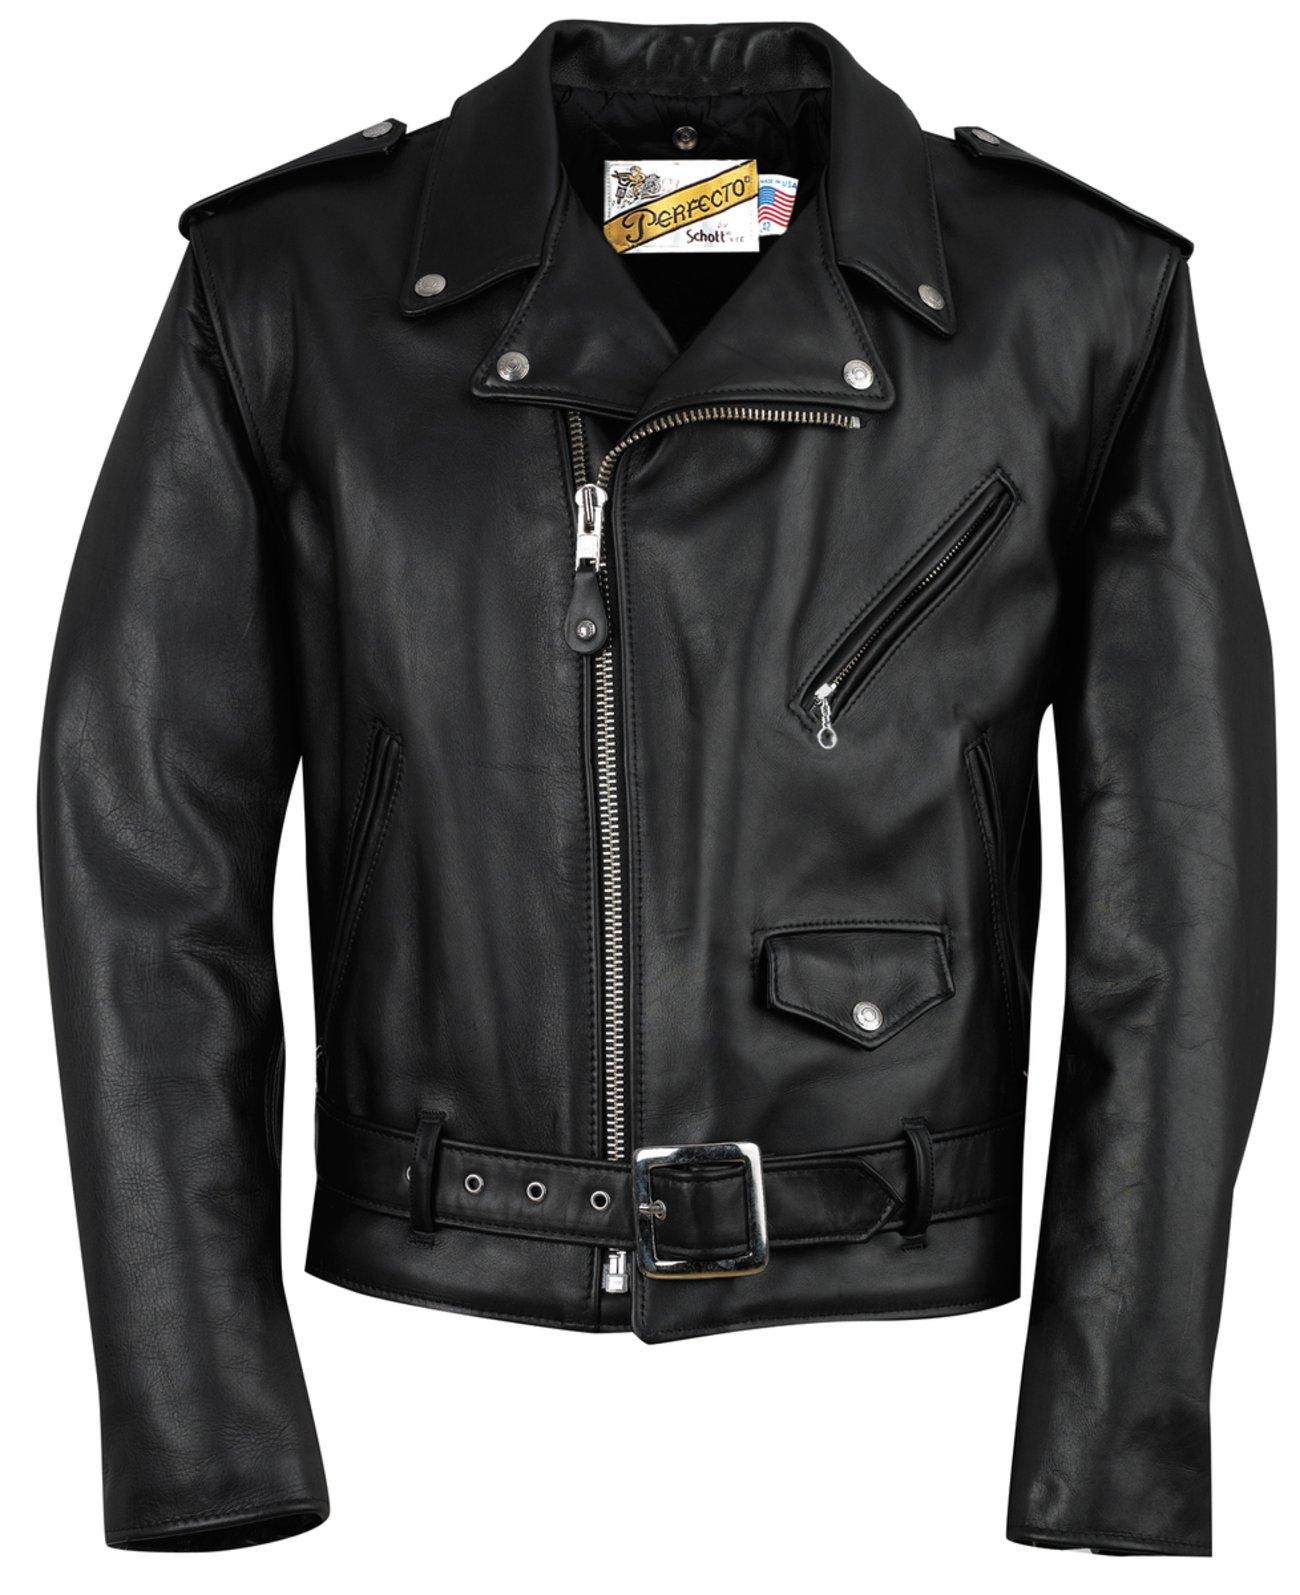 Schott leather jackets for men